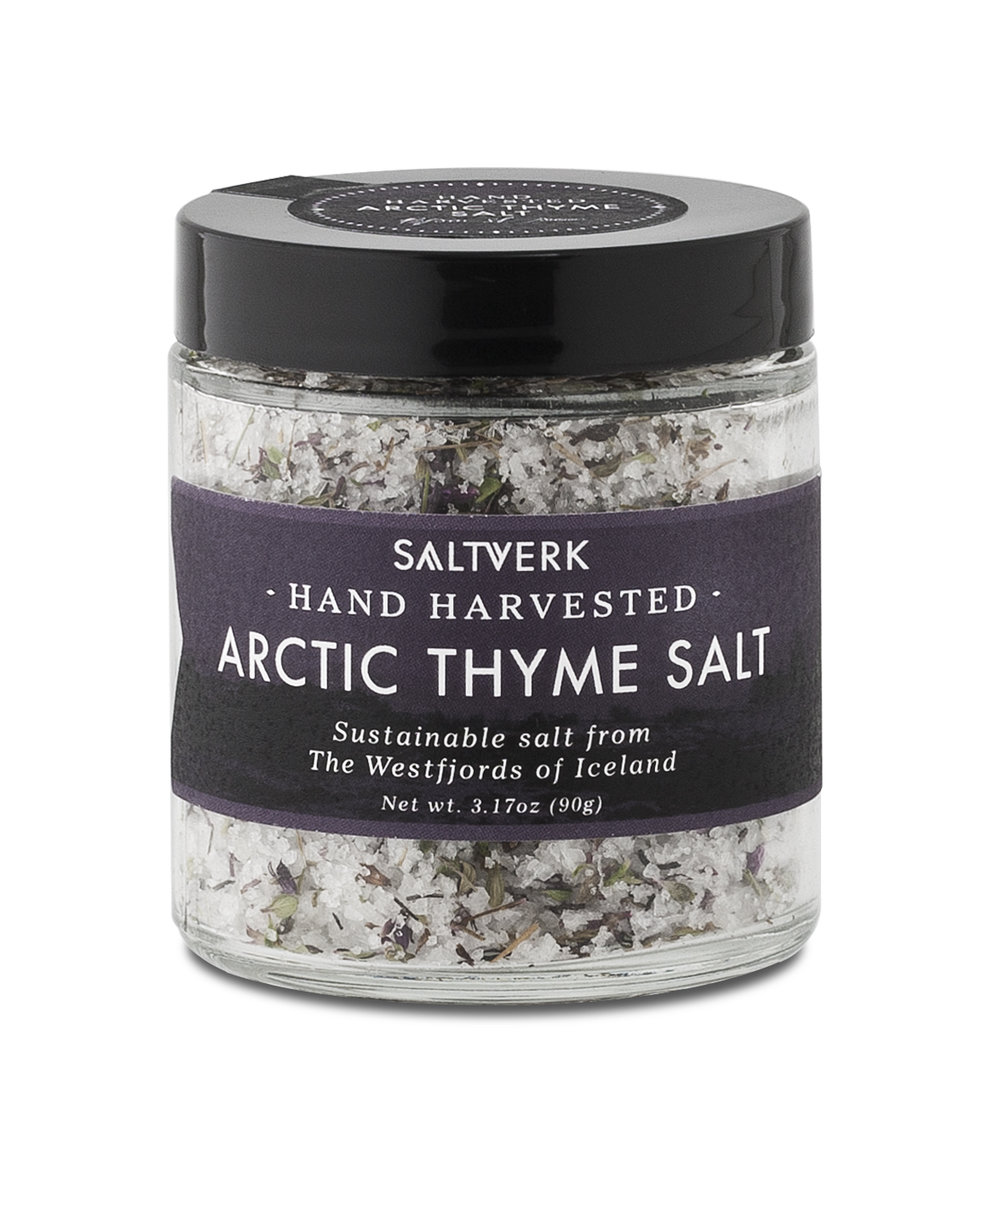 Arctic thyme salt - $12.99